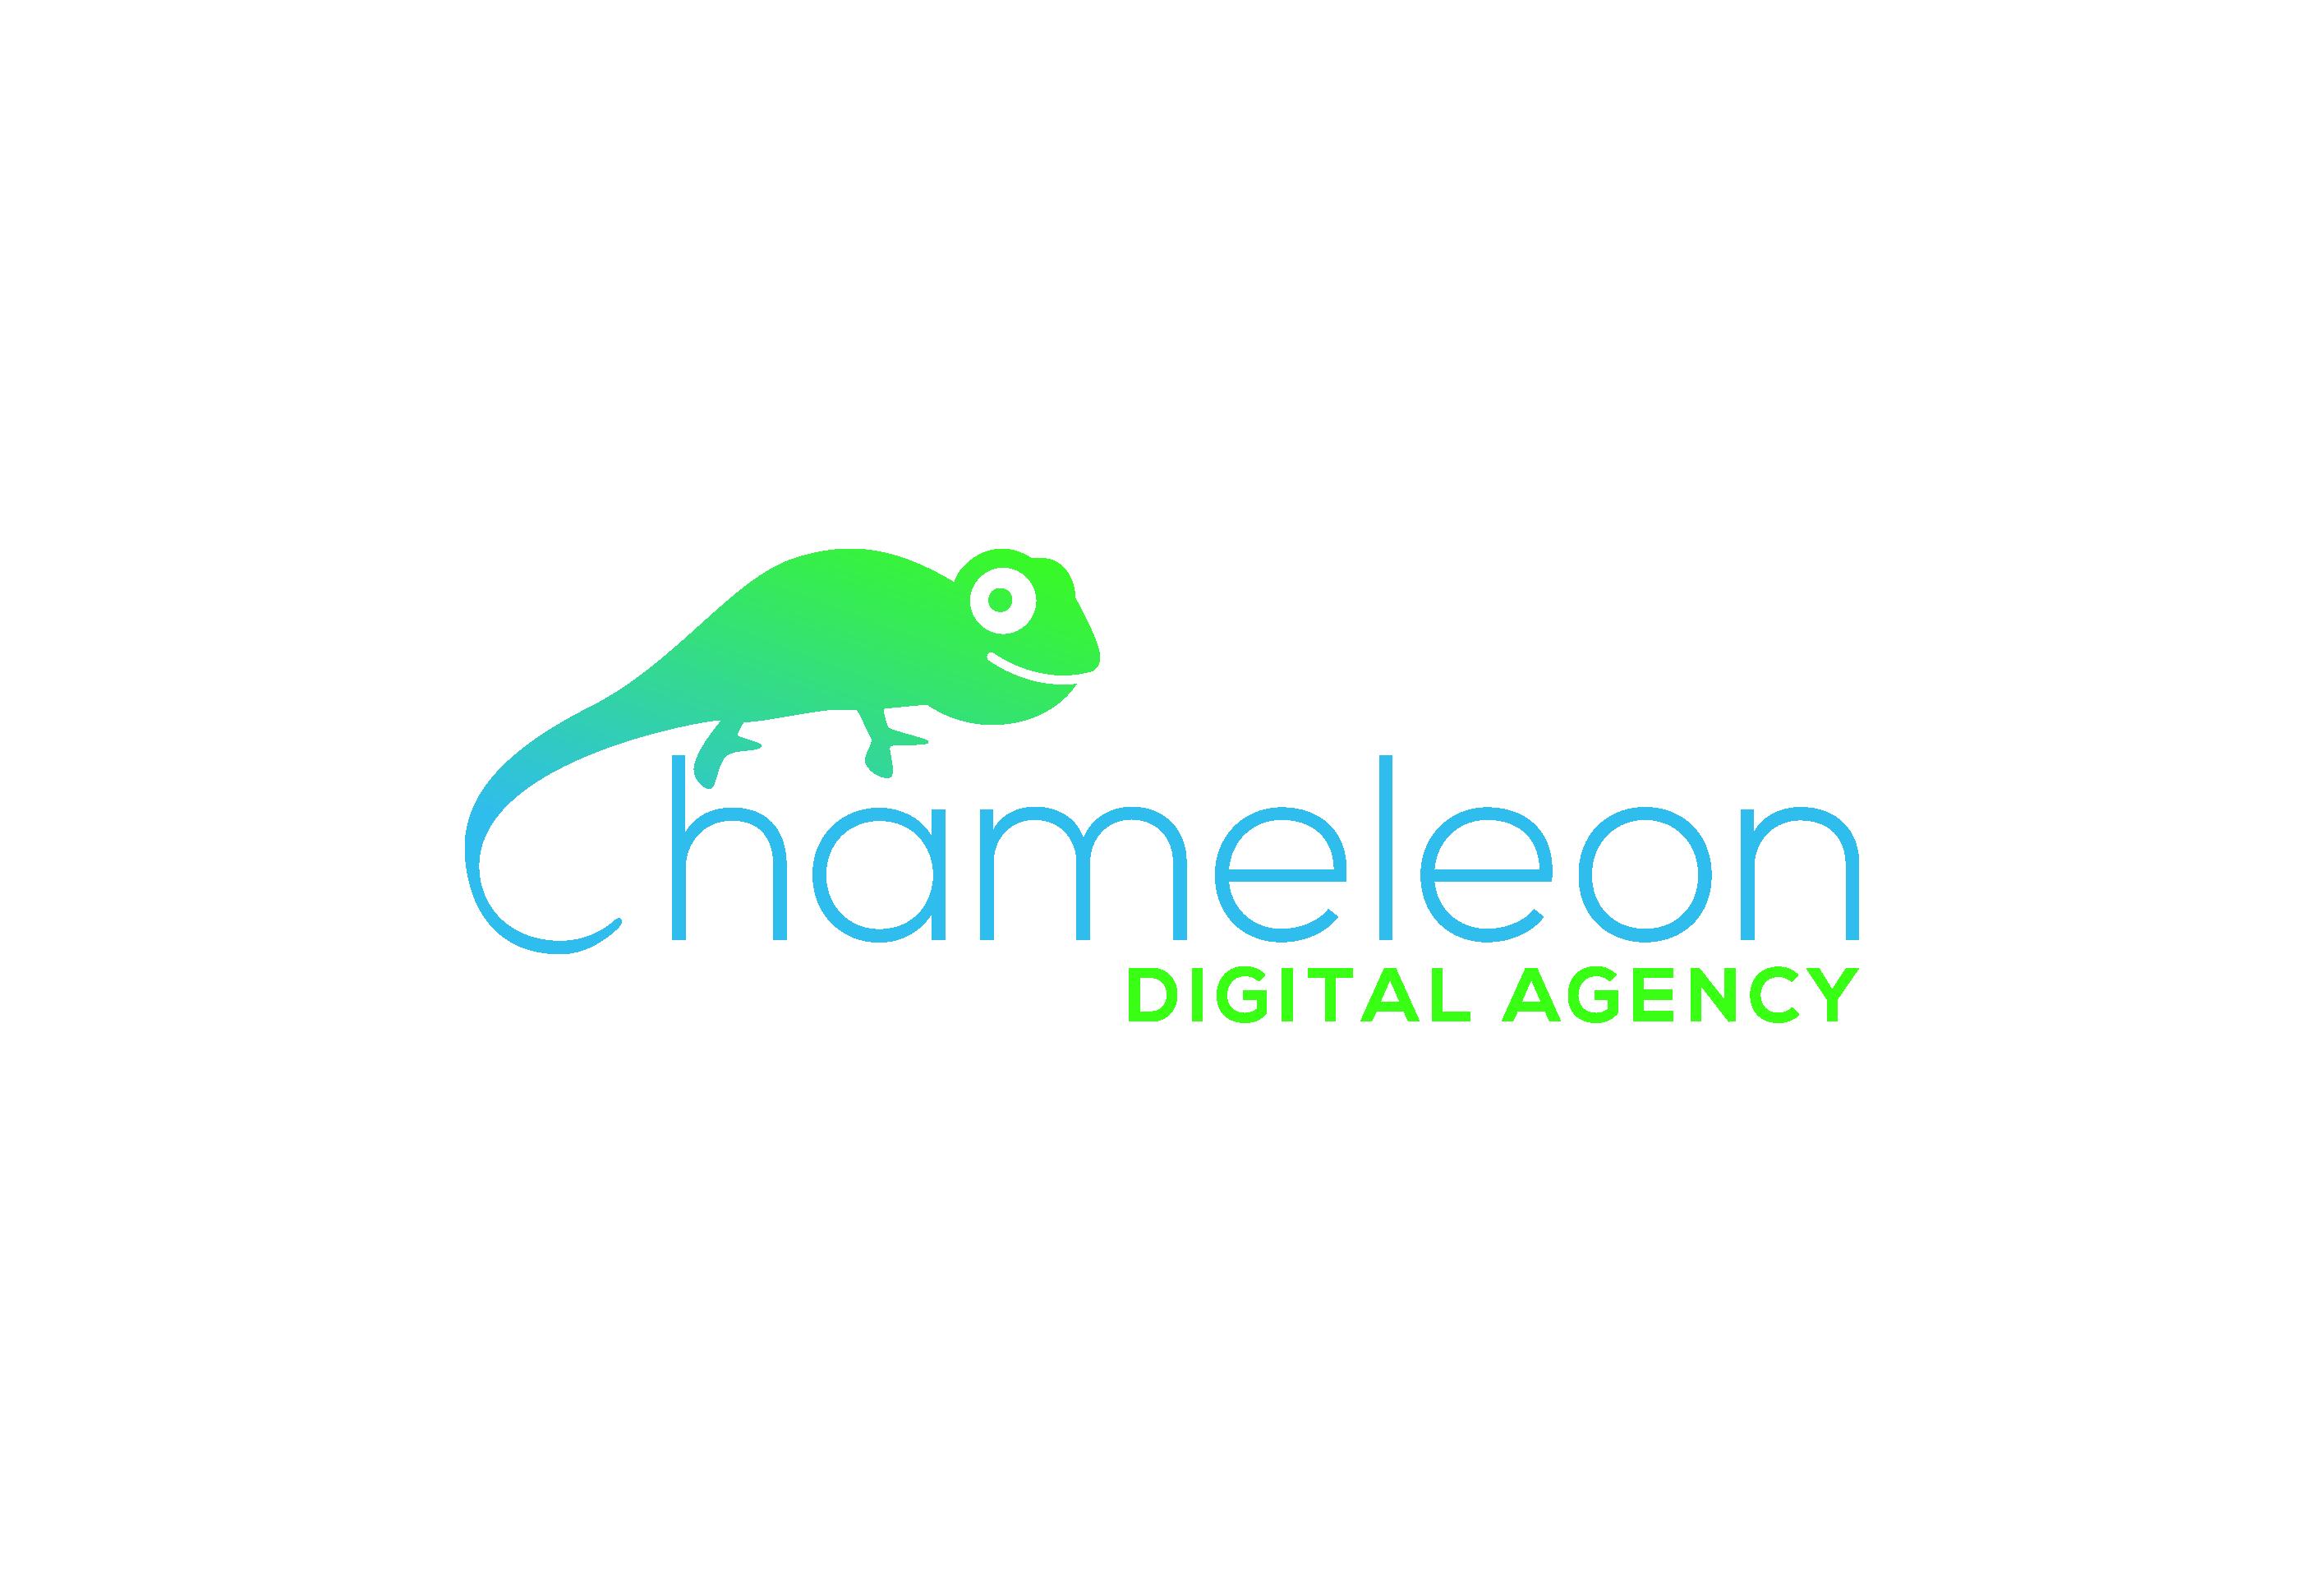 ChameleonDigital_Agency01